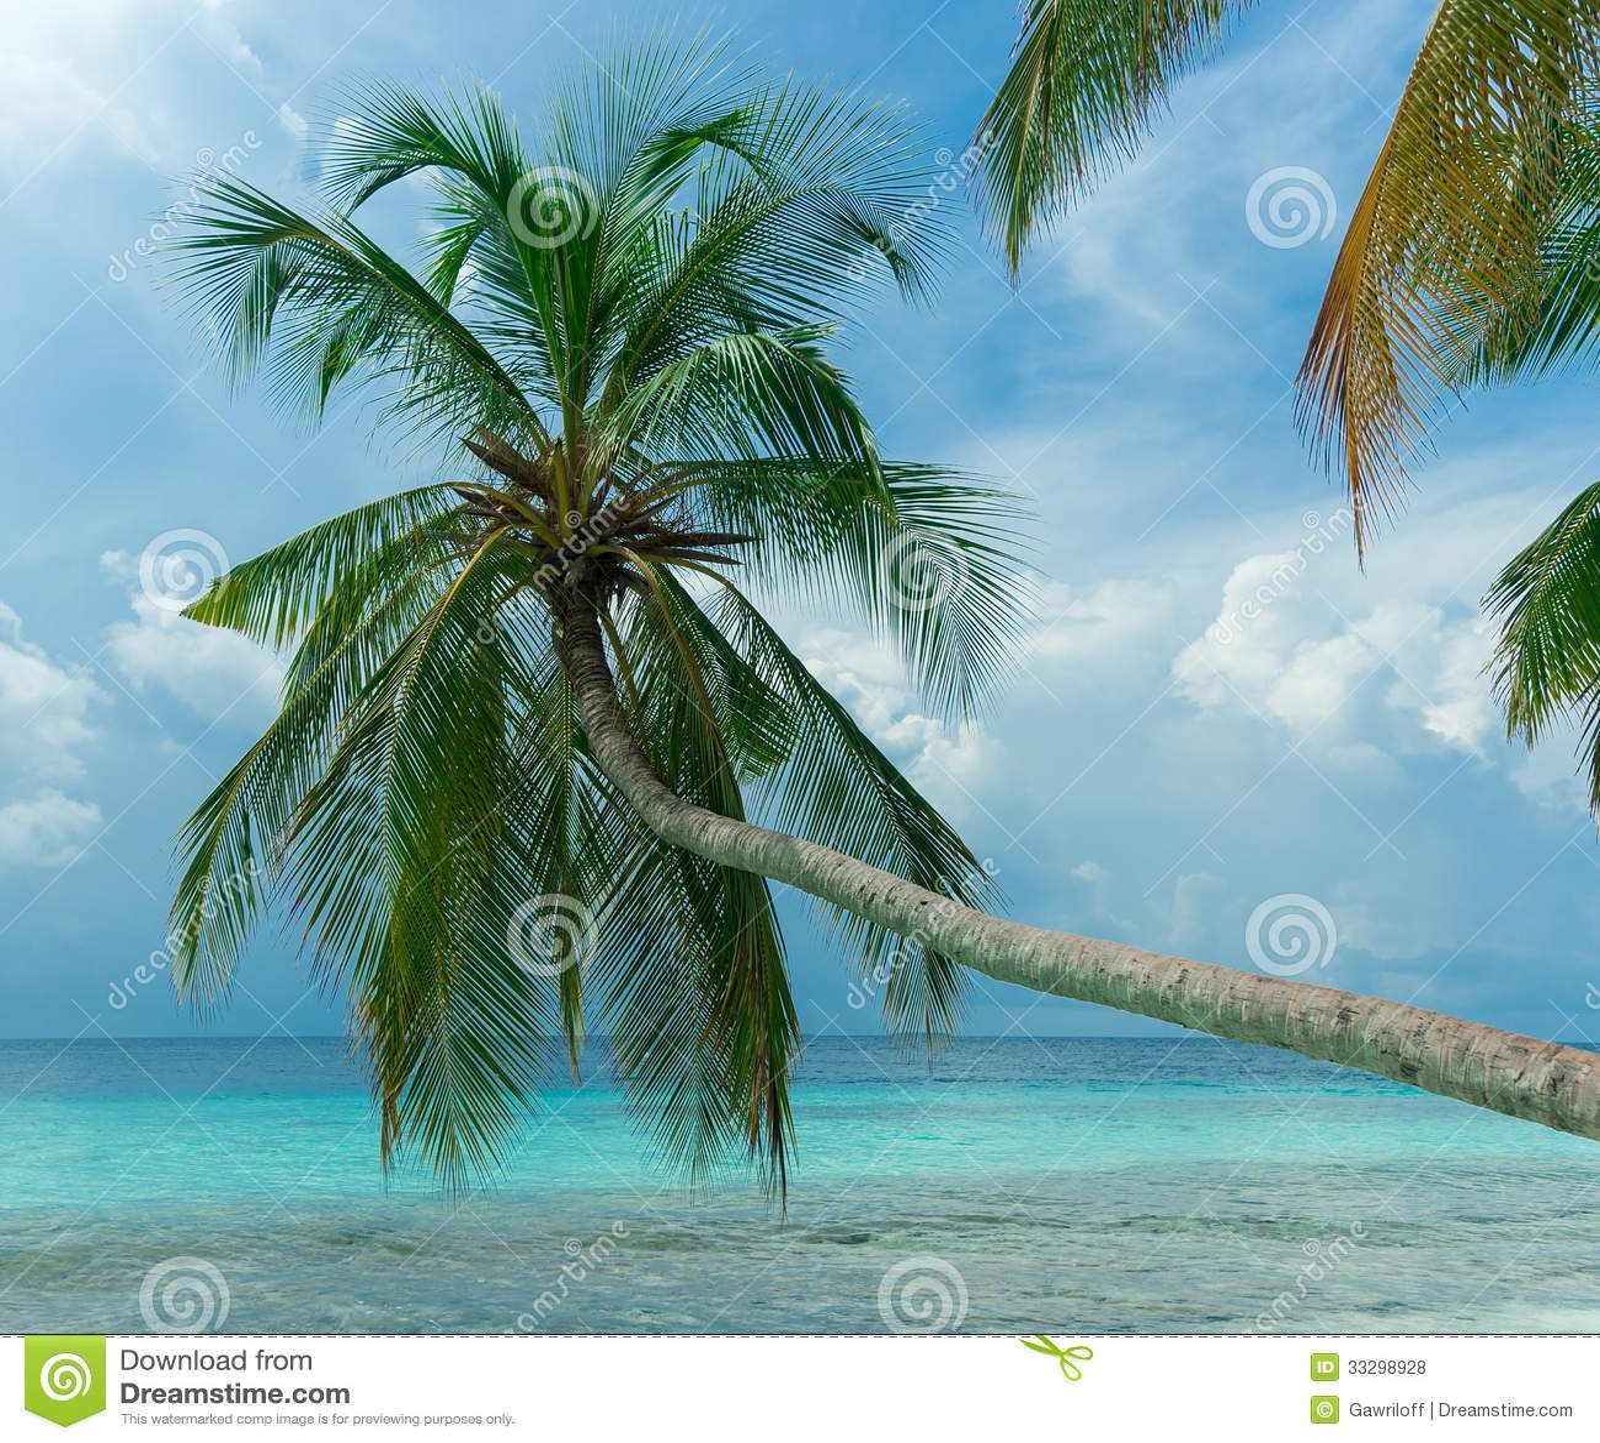 Tropical Island Paradise: Perfect Tropical Island Paradise Beach Stock Photo